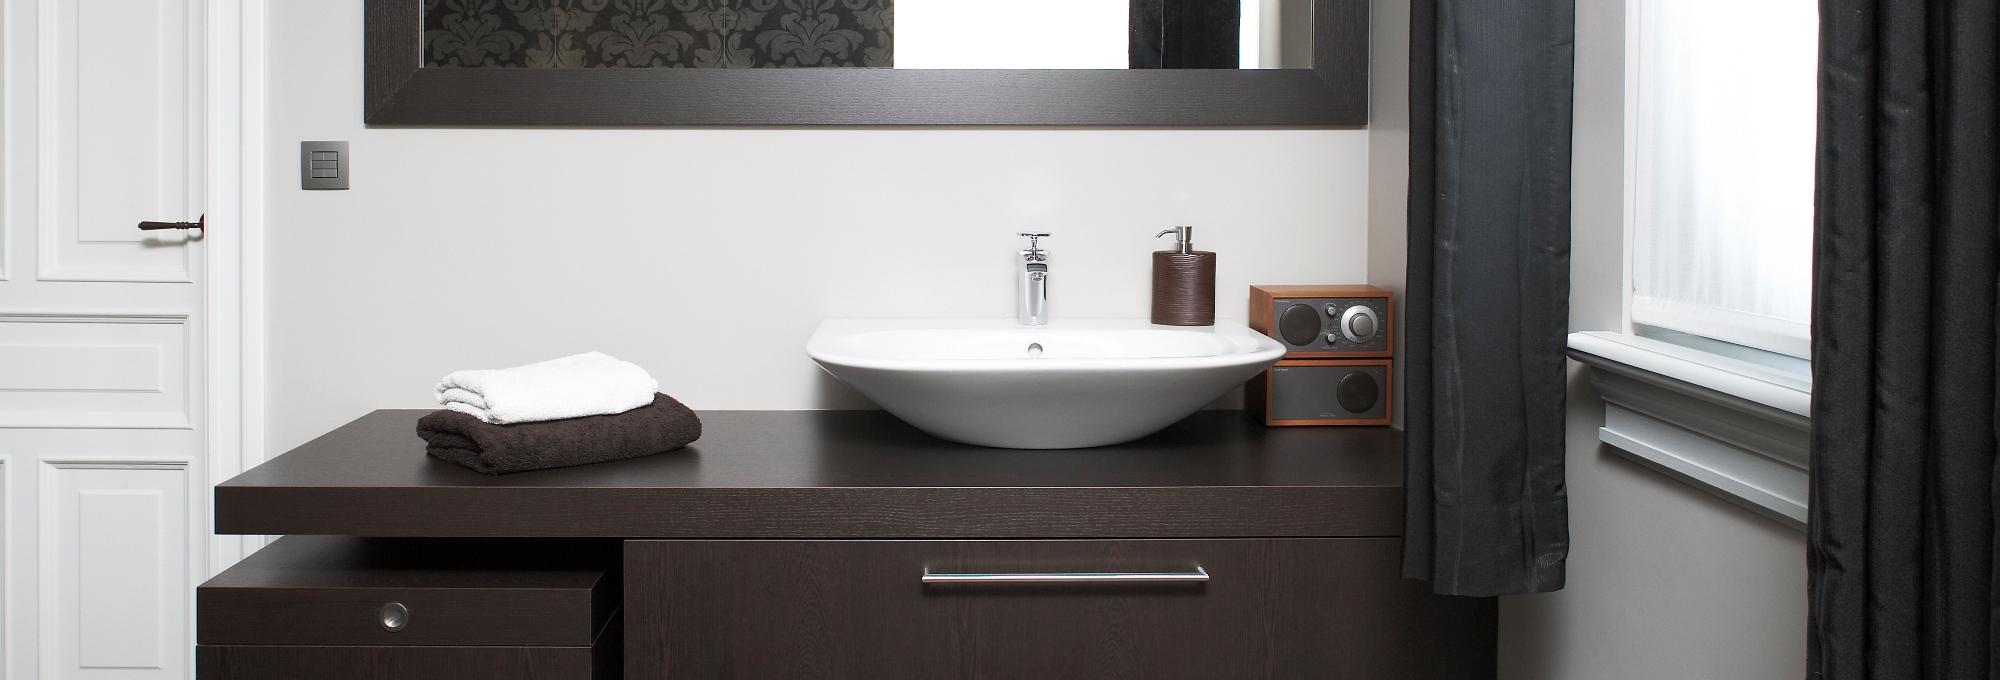 Keukens, badkamers, totaalinterieur   Interieur Geenen